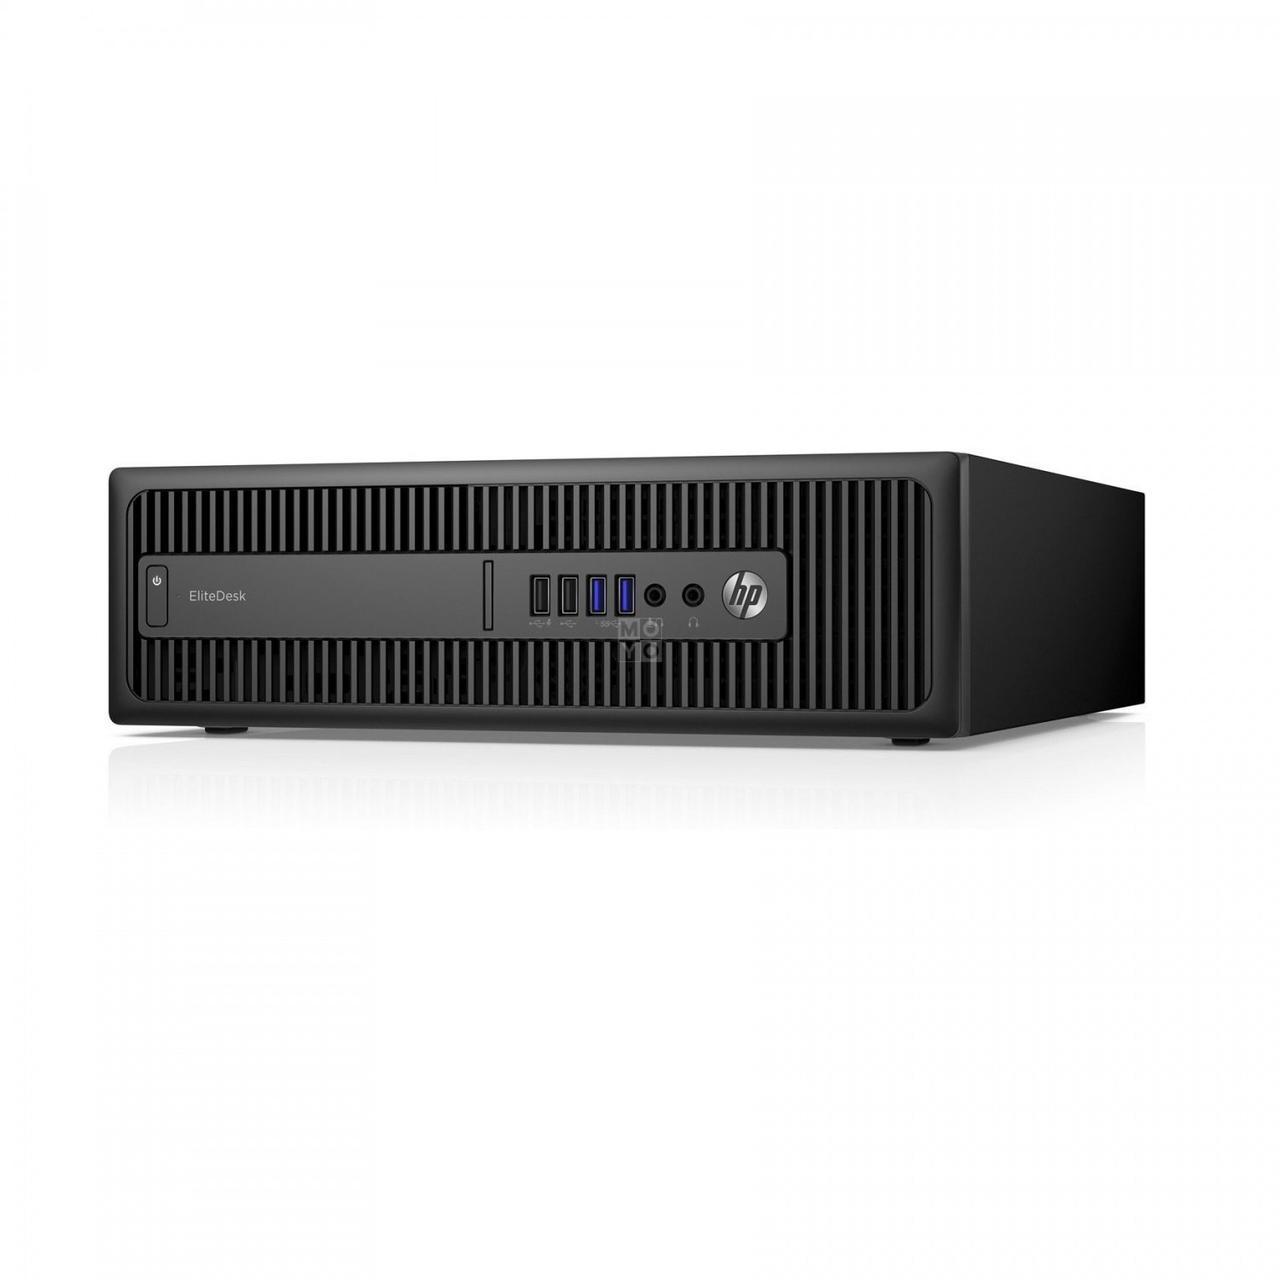 Cистемный блок HP EliteDesk 800 G2 i5-6600 4RAM DDR4 120SSD SFF